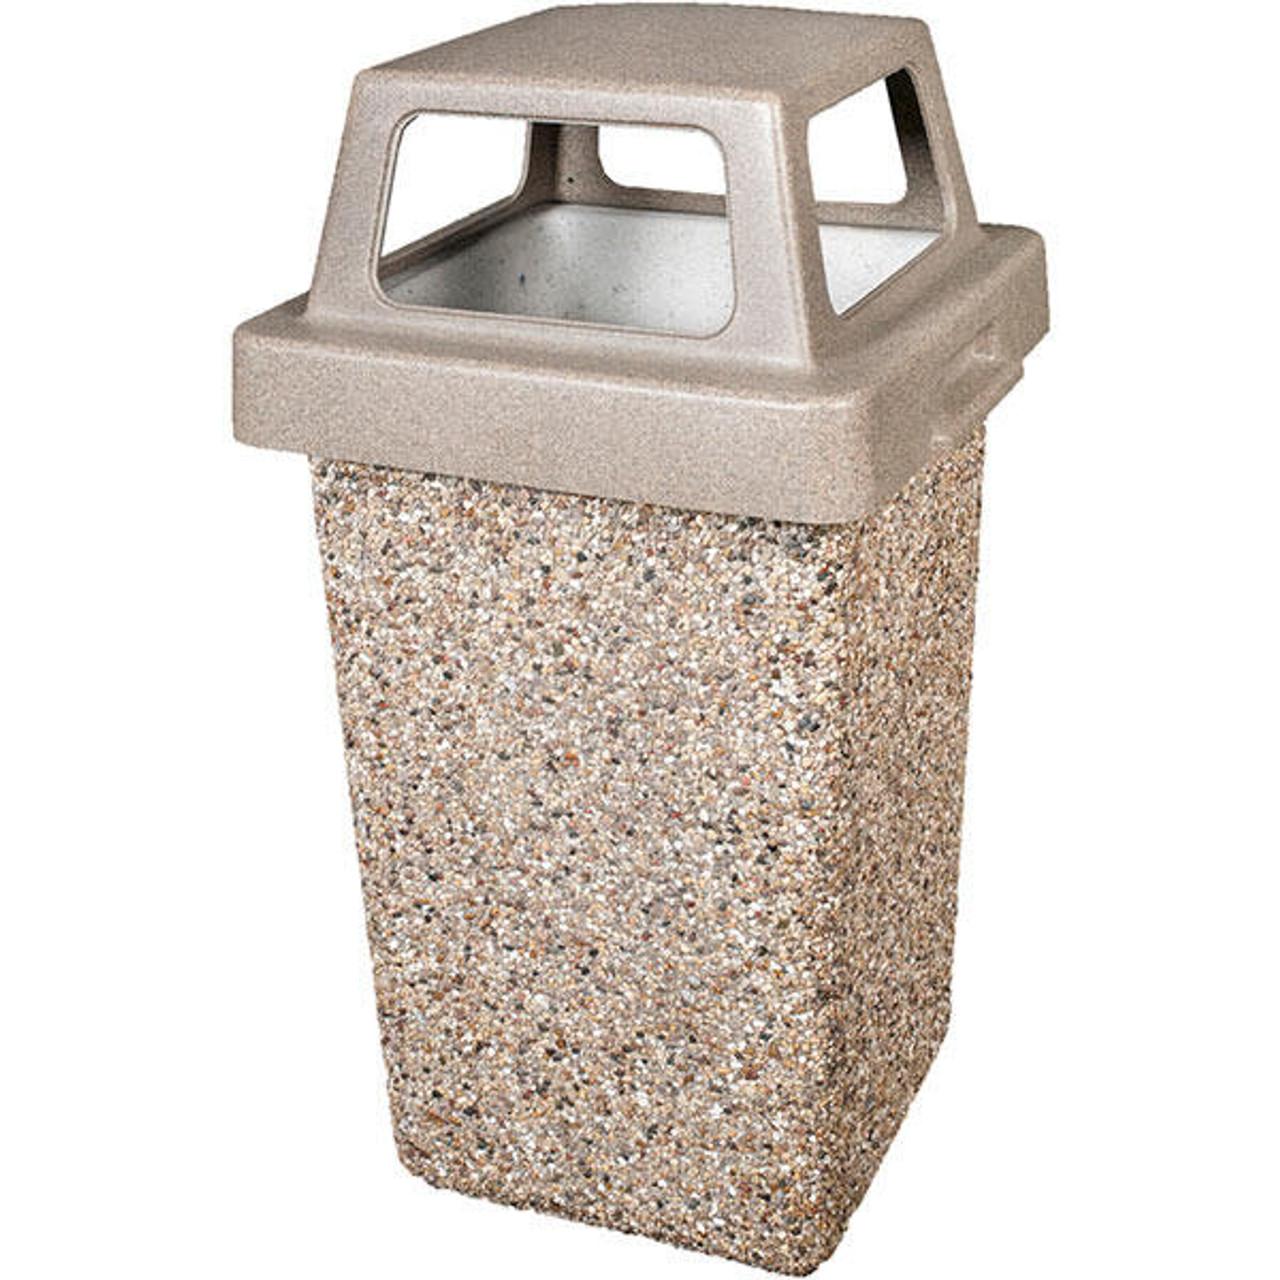 30 Gallon Concrete 4 Way Open Top Outdoor Trash can TF1016 Exposed Aggregate